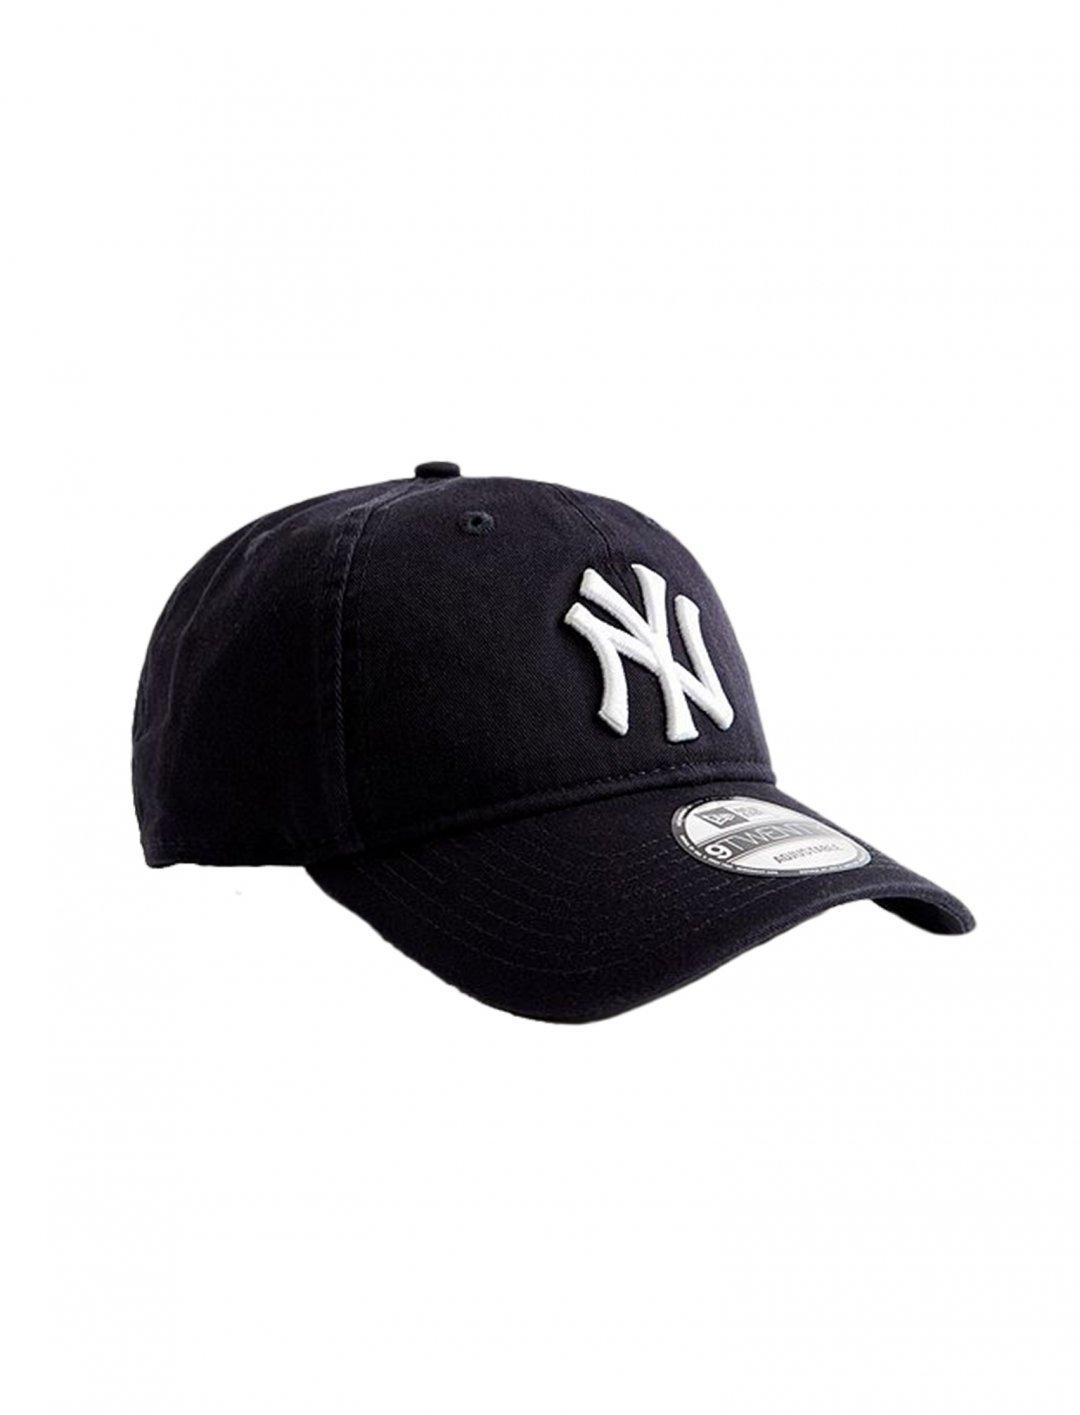 "New Era NY Yankees Cap {""id"":5,""product_section_id"":1,""name"":""Clothing"",""order"":5} New Era"